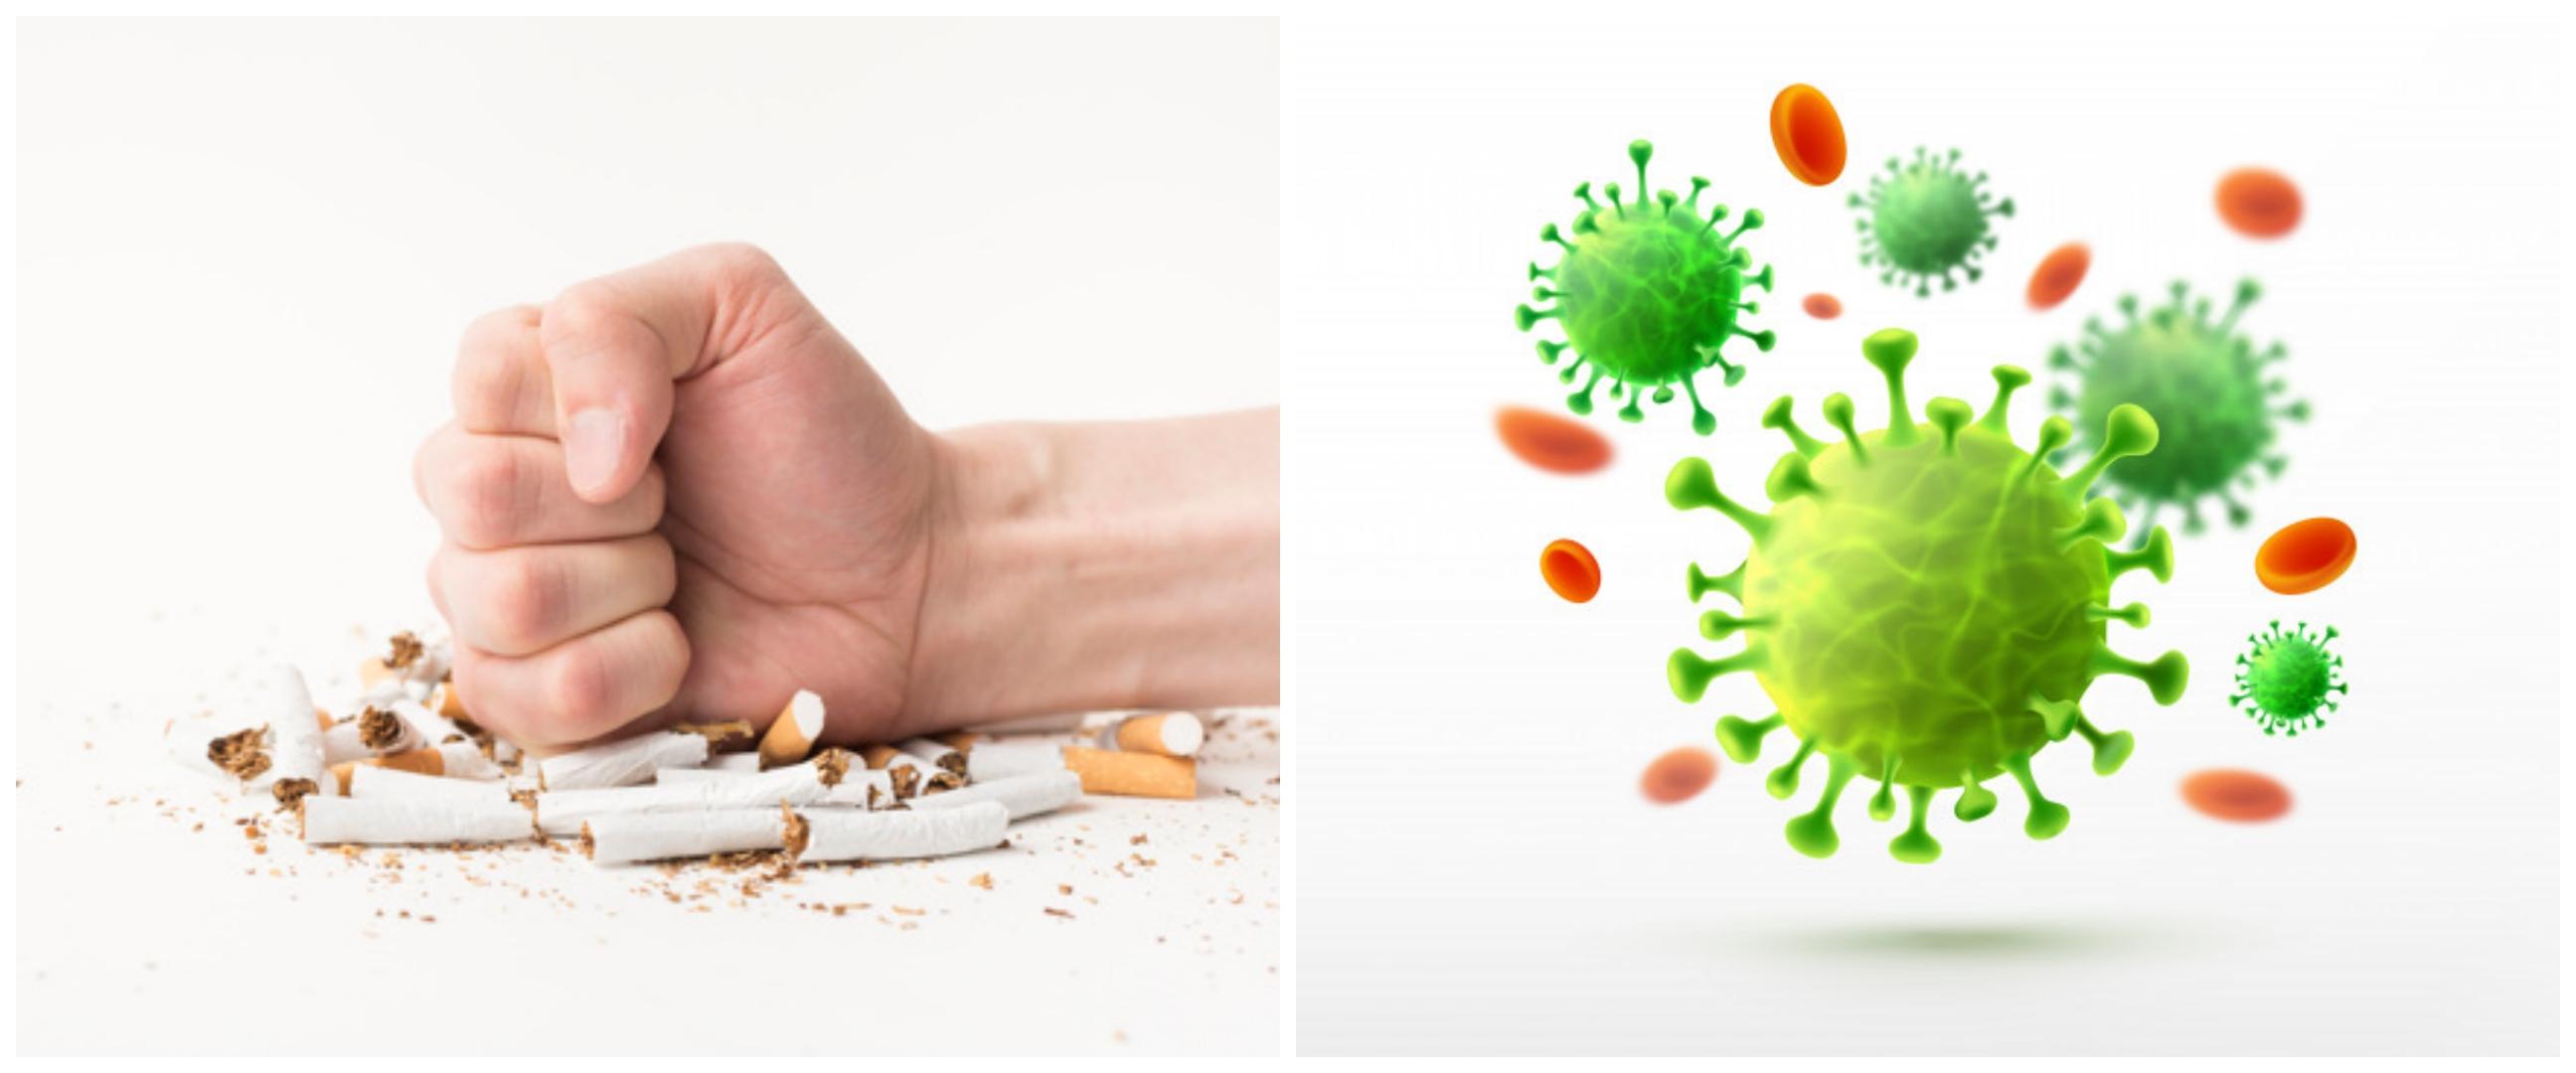 Berhentilah merokok saat pandemi Corona, ini sebabnya